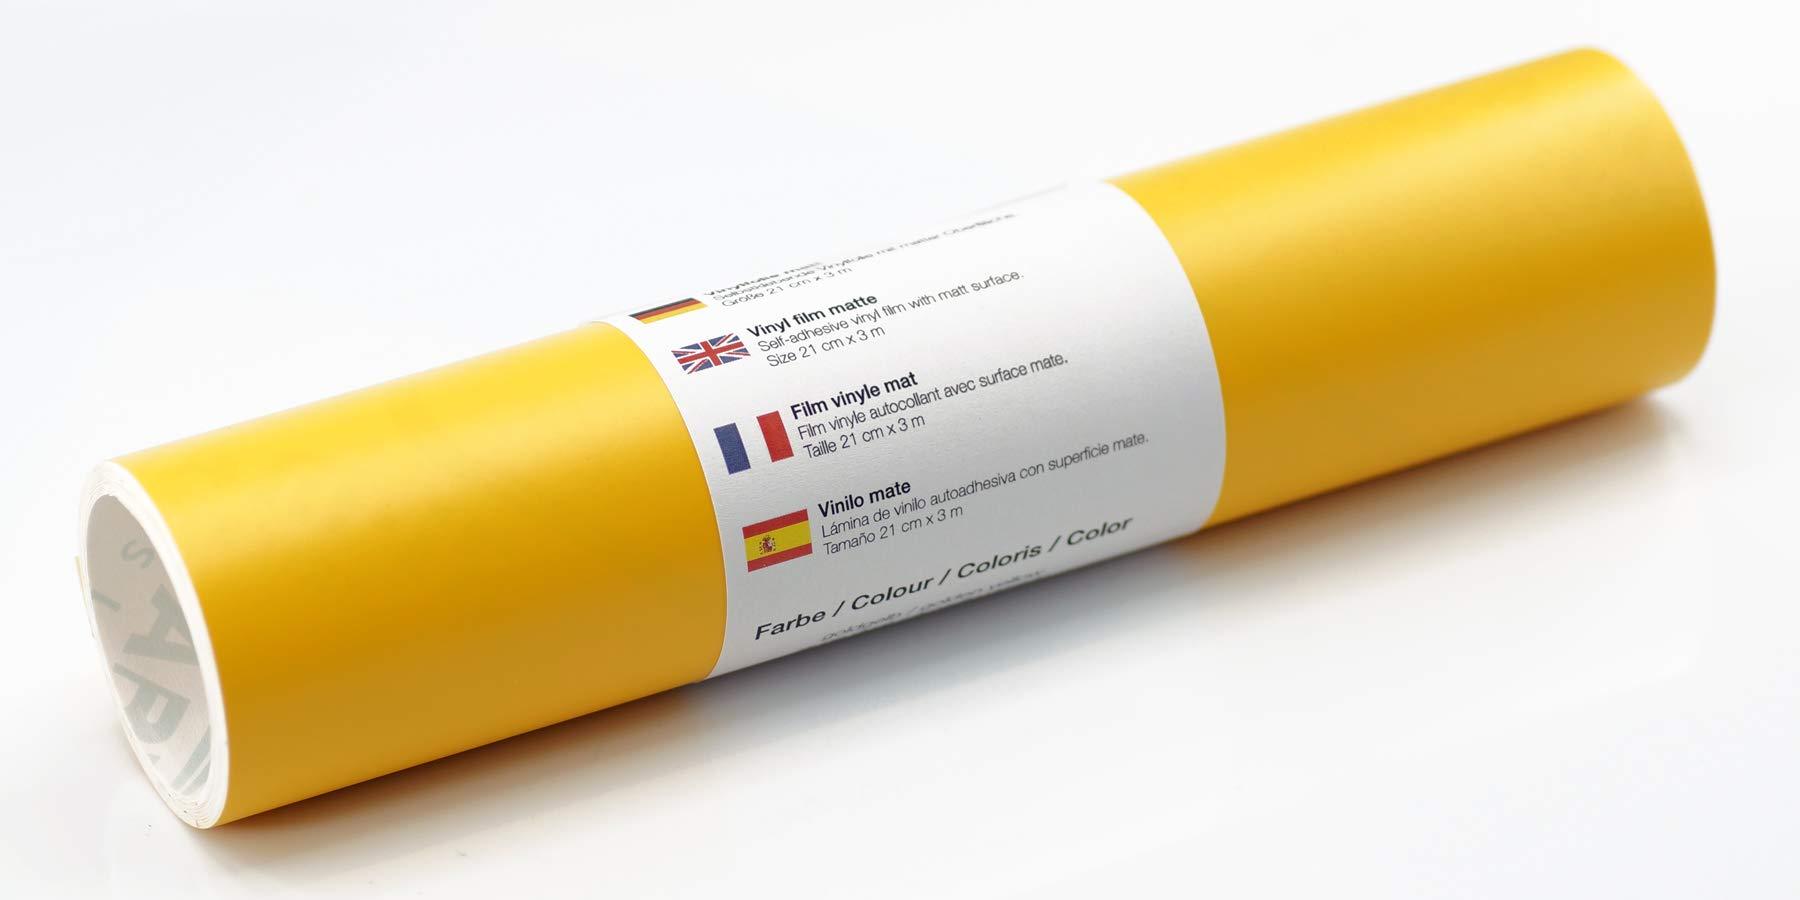 Lámina de tatuaje de pared mate 21 cm x 3 m - elección de colores, Color:Amarillo Dorado: Amazon.es: Hogar